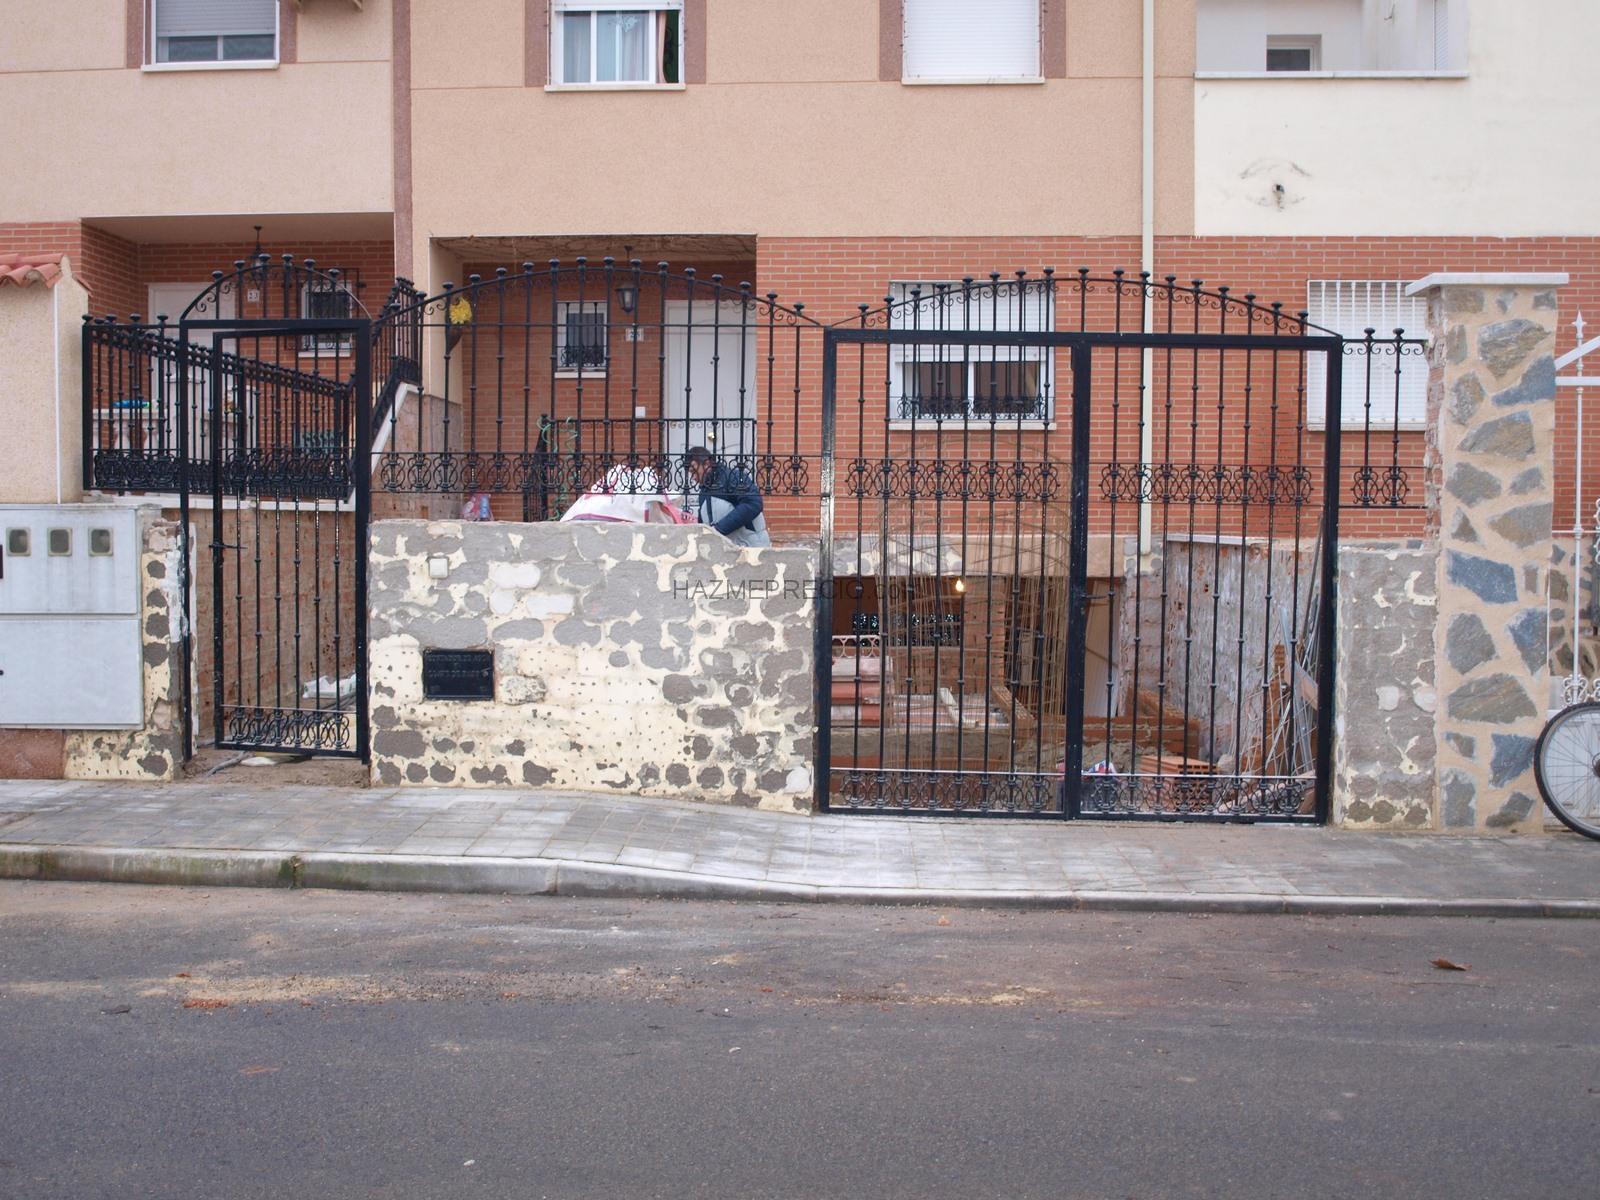 Rahabilitacion de fachada en ladrillo visto rustico con - Fachadas ladrillo rustico ...